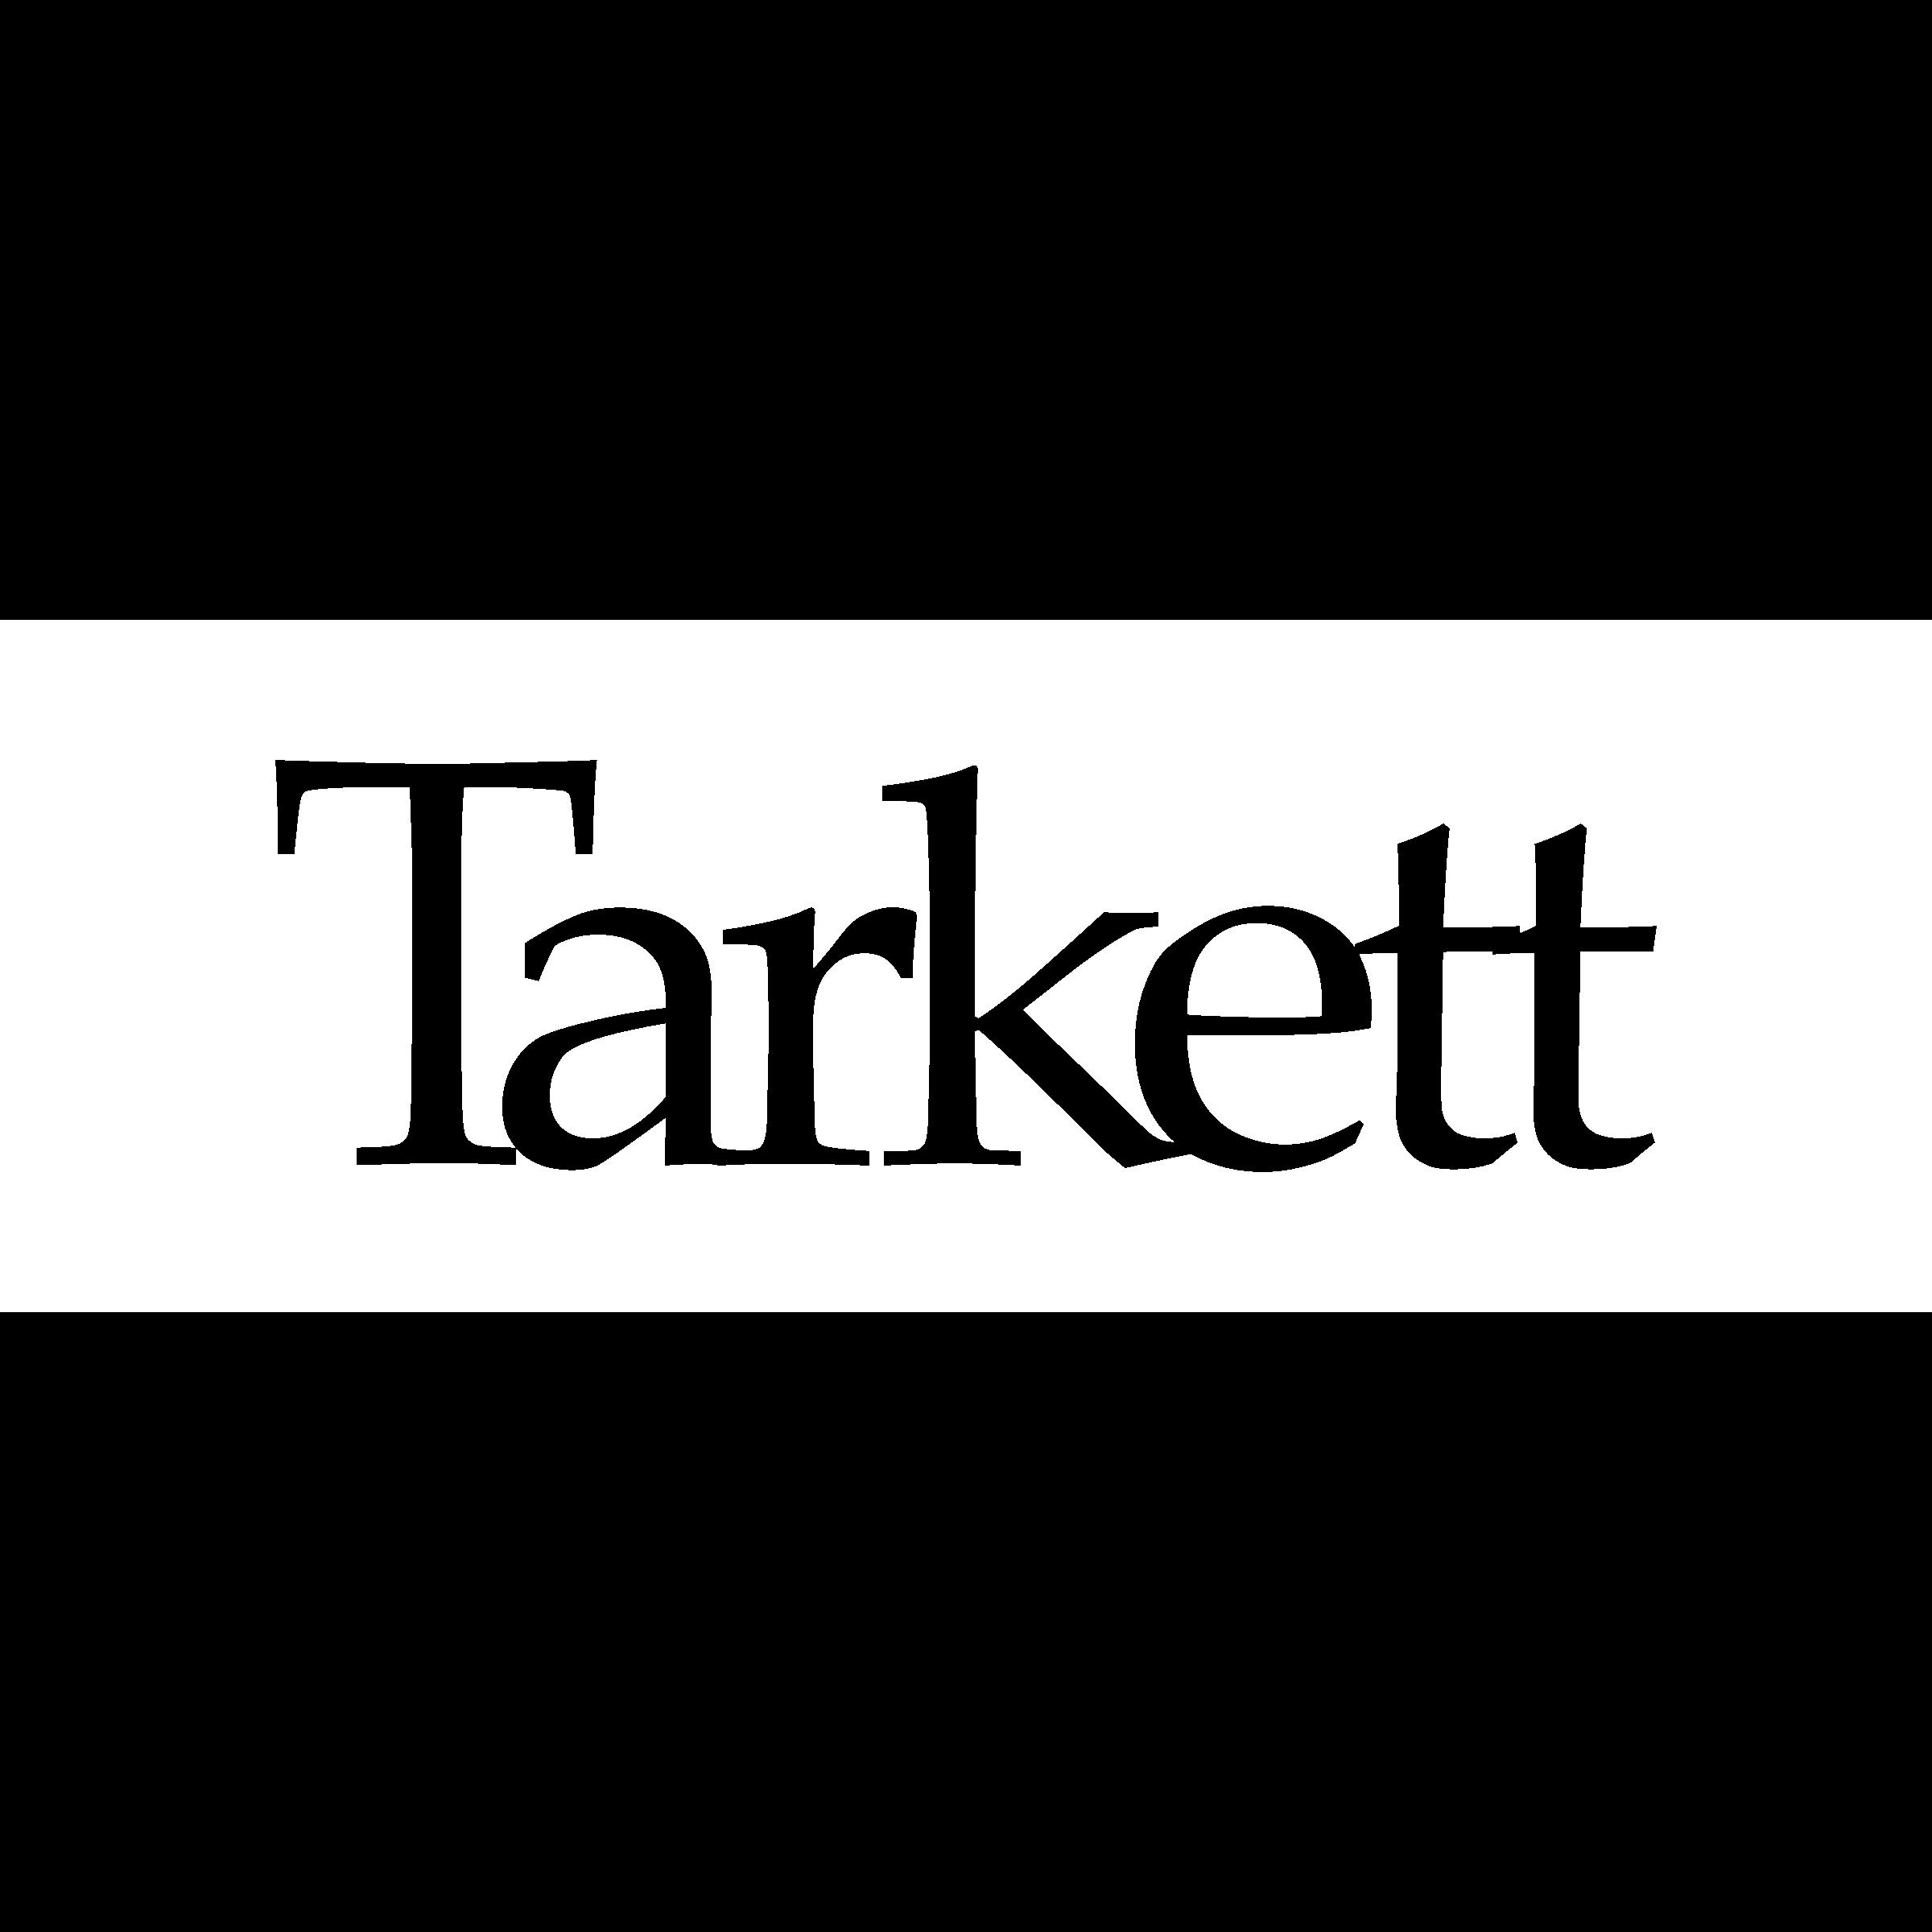 Tarkett Logo Black And White